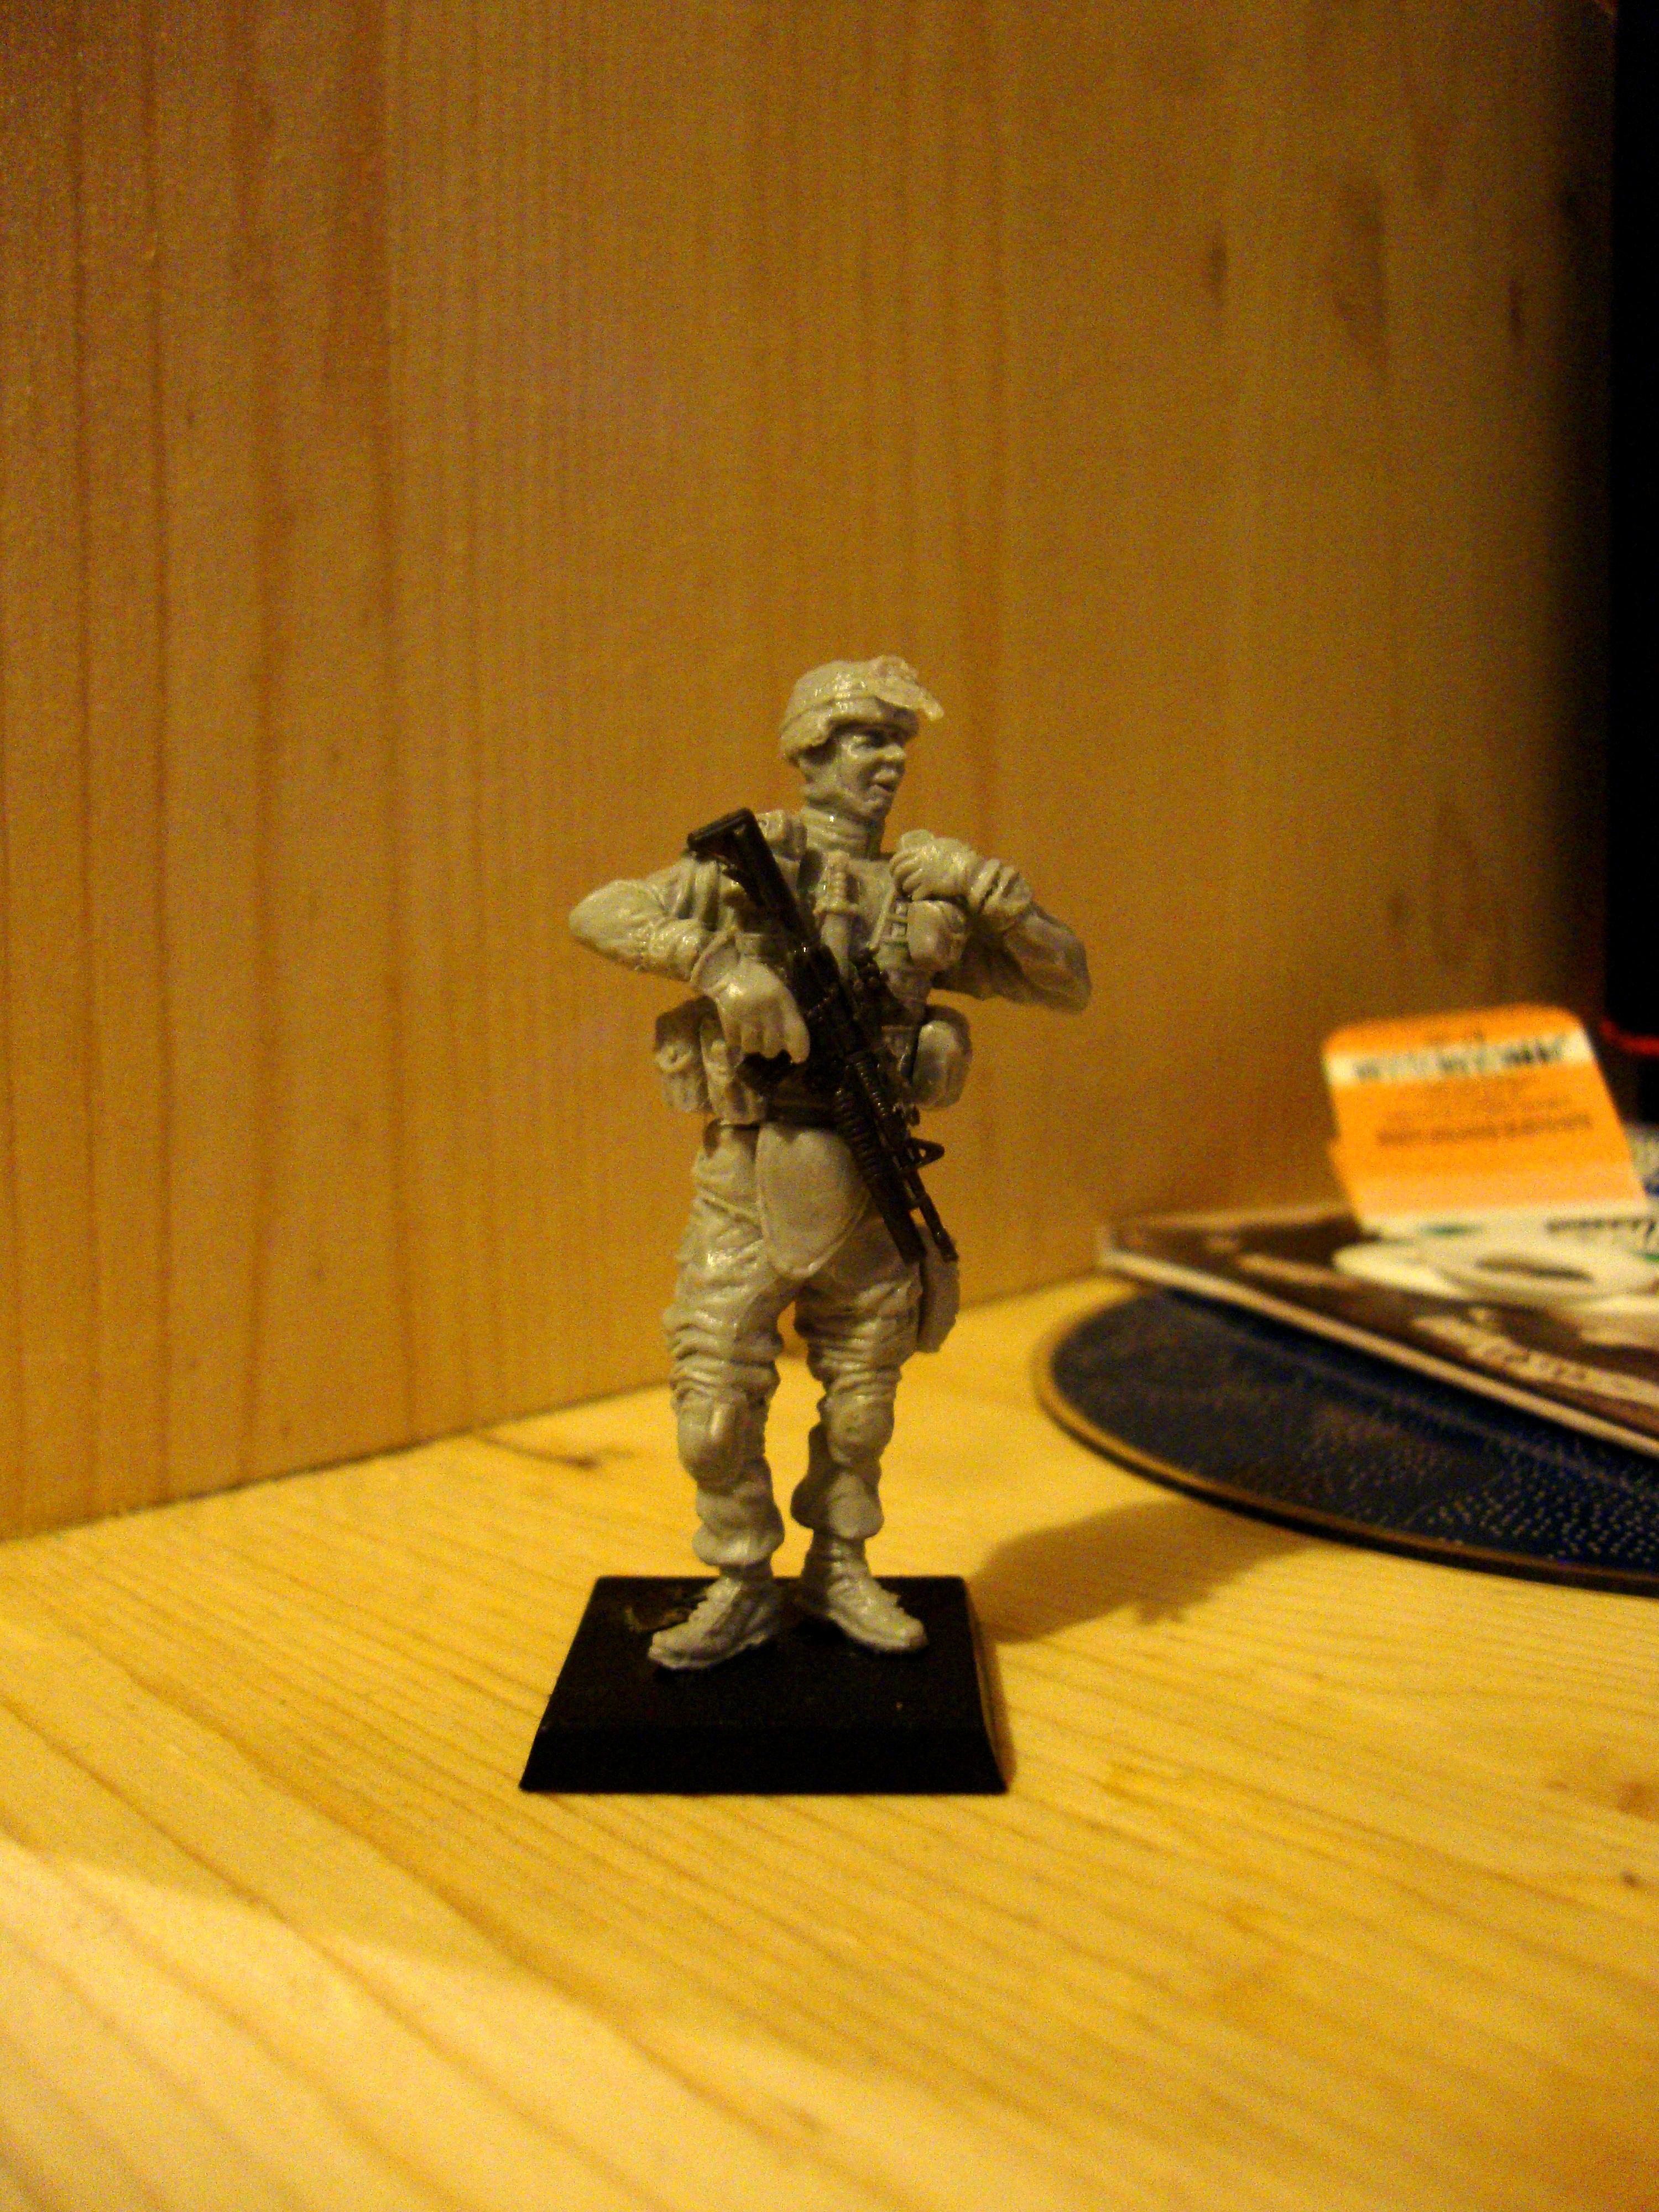 Canadian, Infantry, Modern, Skirmish, Work In Progress